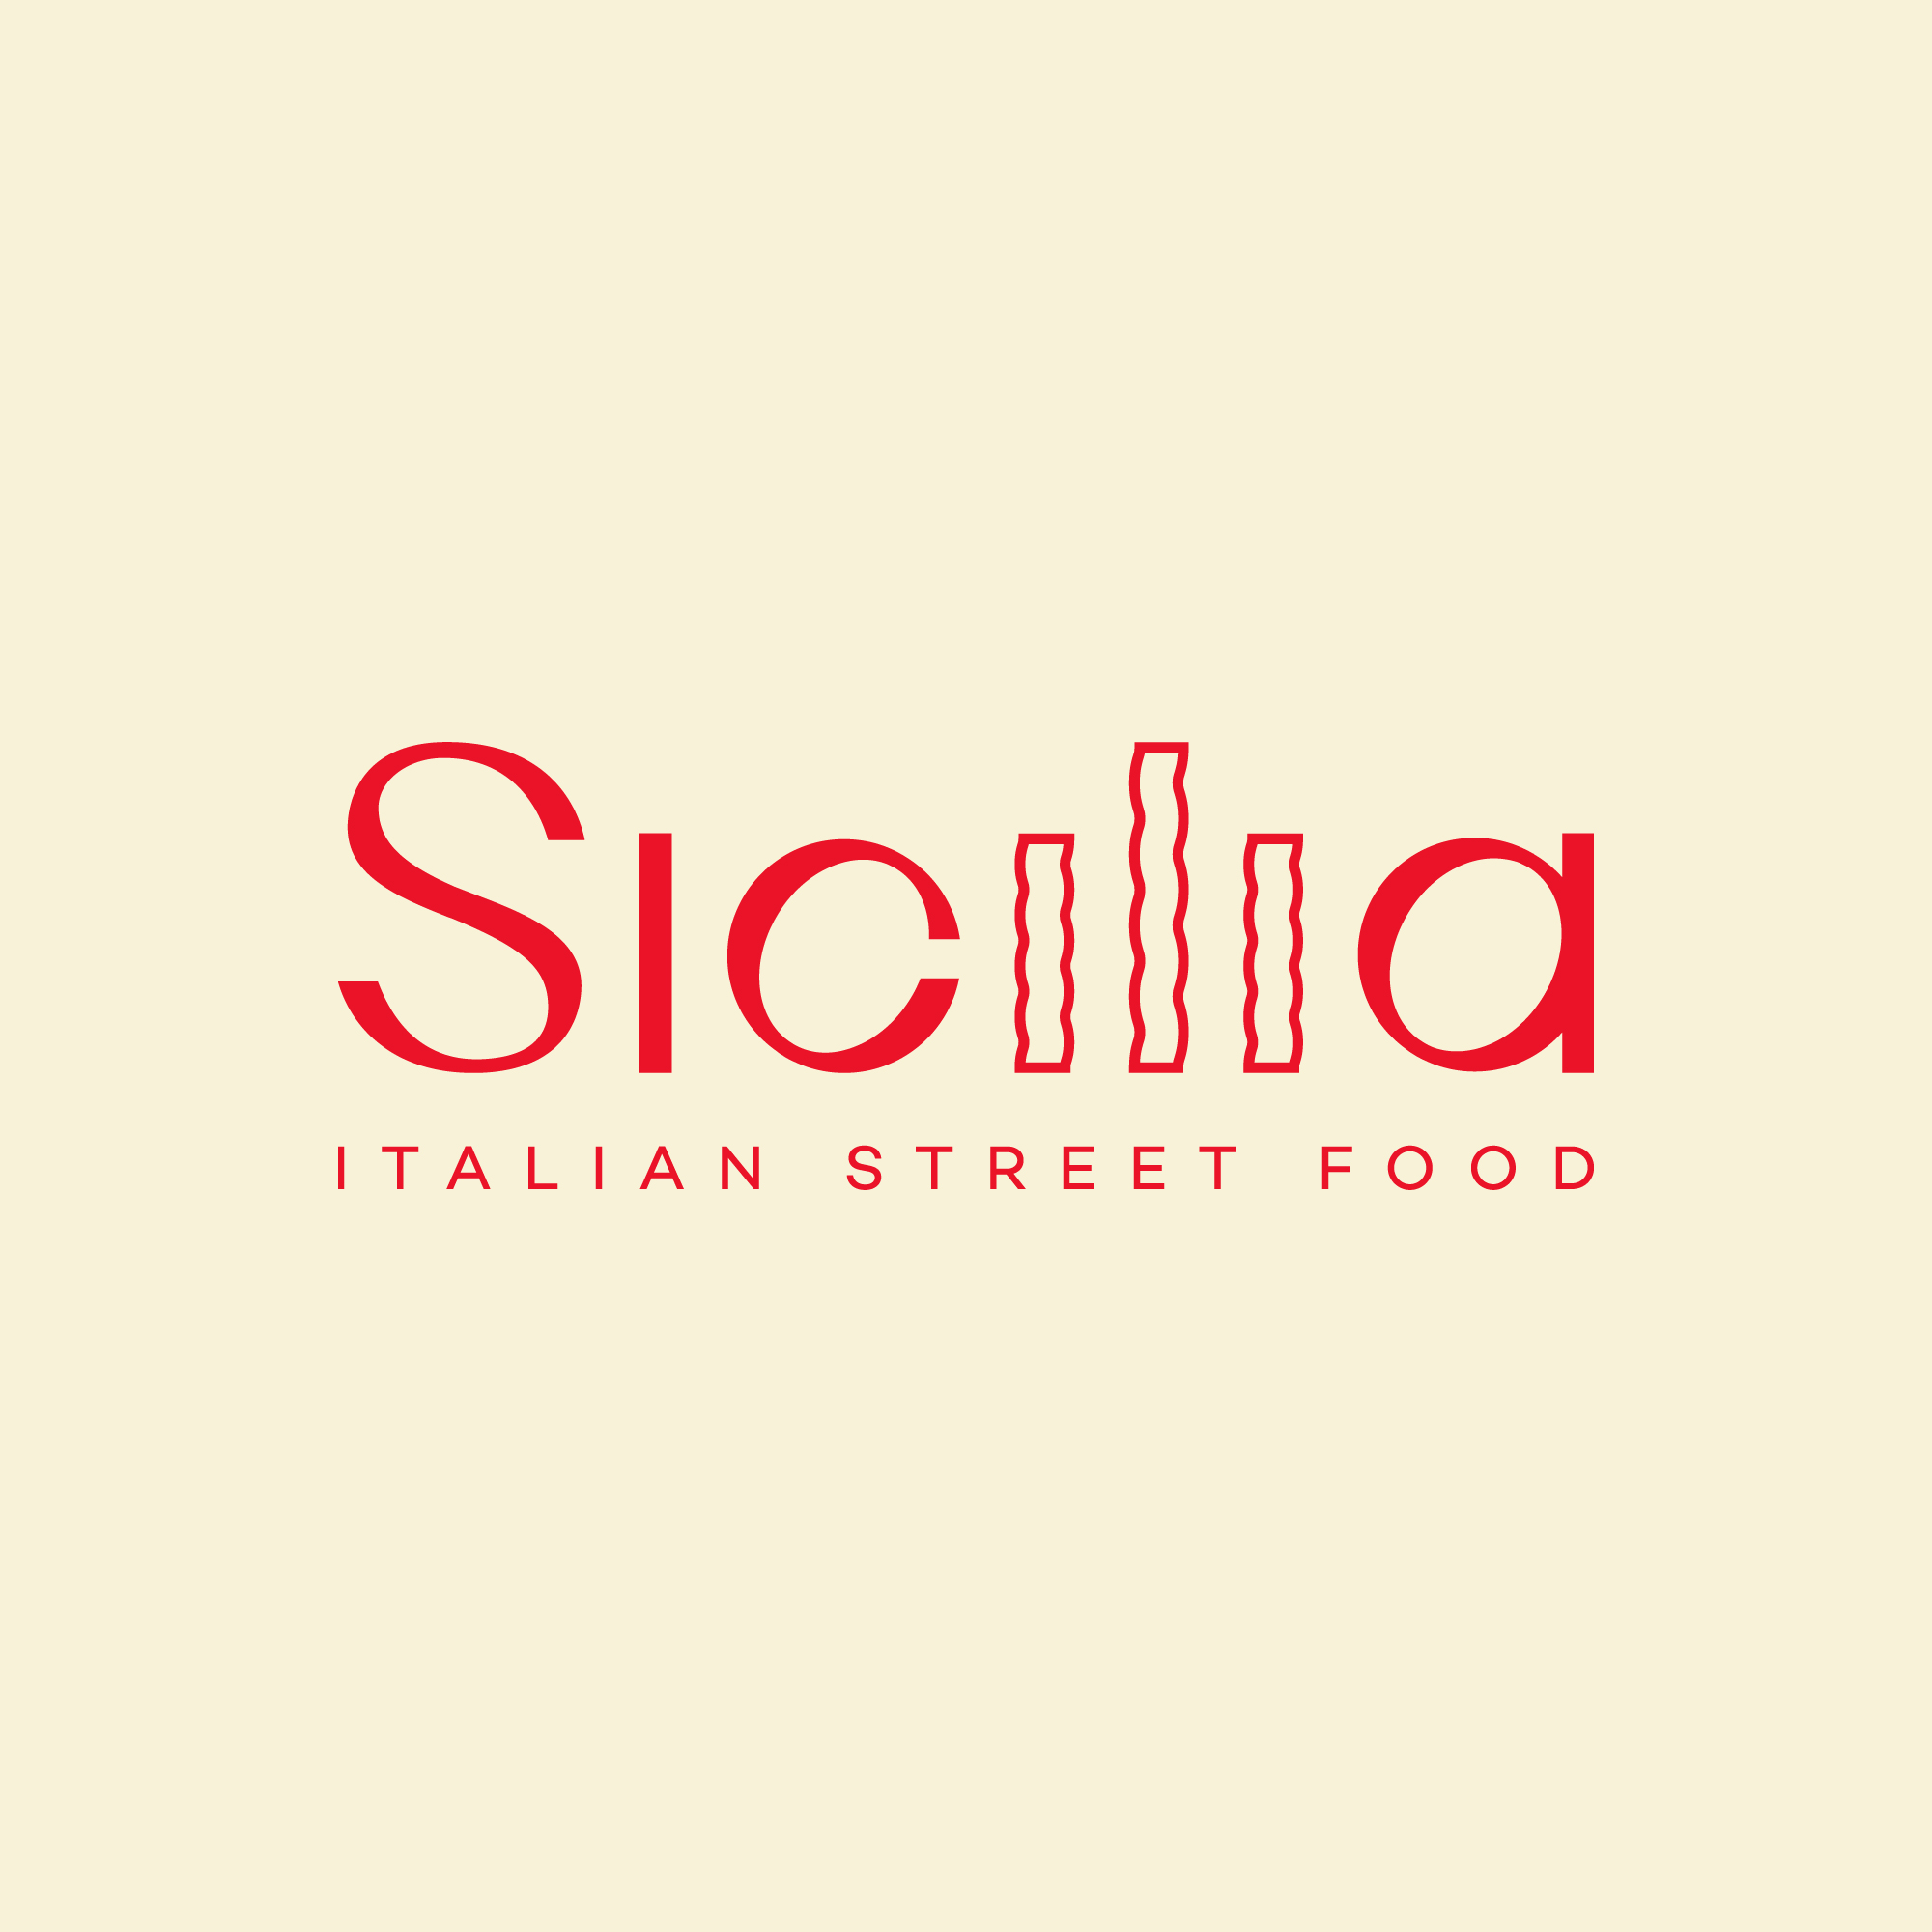 Sicilia Italian Street Food – Brand Design by Andrijana Miladinovic